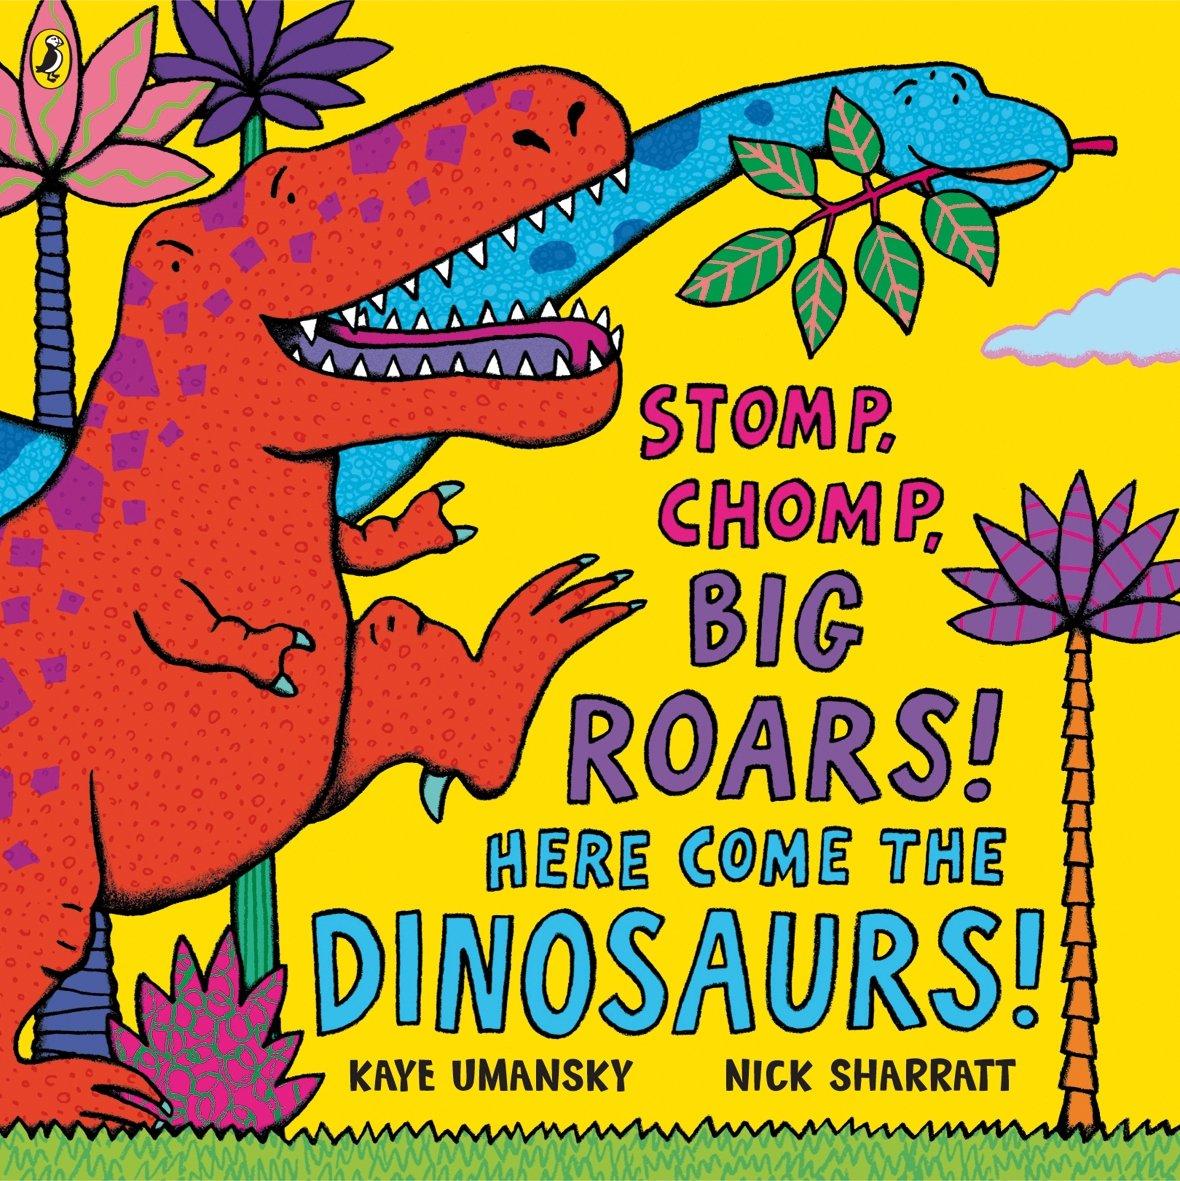 Stomp, Chomp, Big Roars! Here Come the Dinosaurs!: Amazon.co.uk: Umansky,  Kaye, Sharratt, Nick: 9780140569353: Books